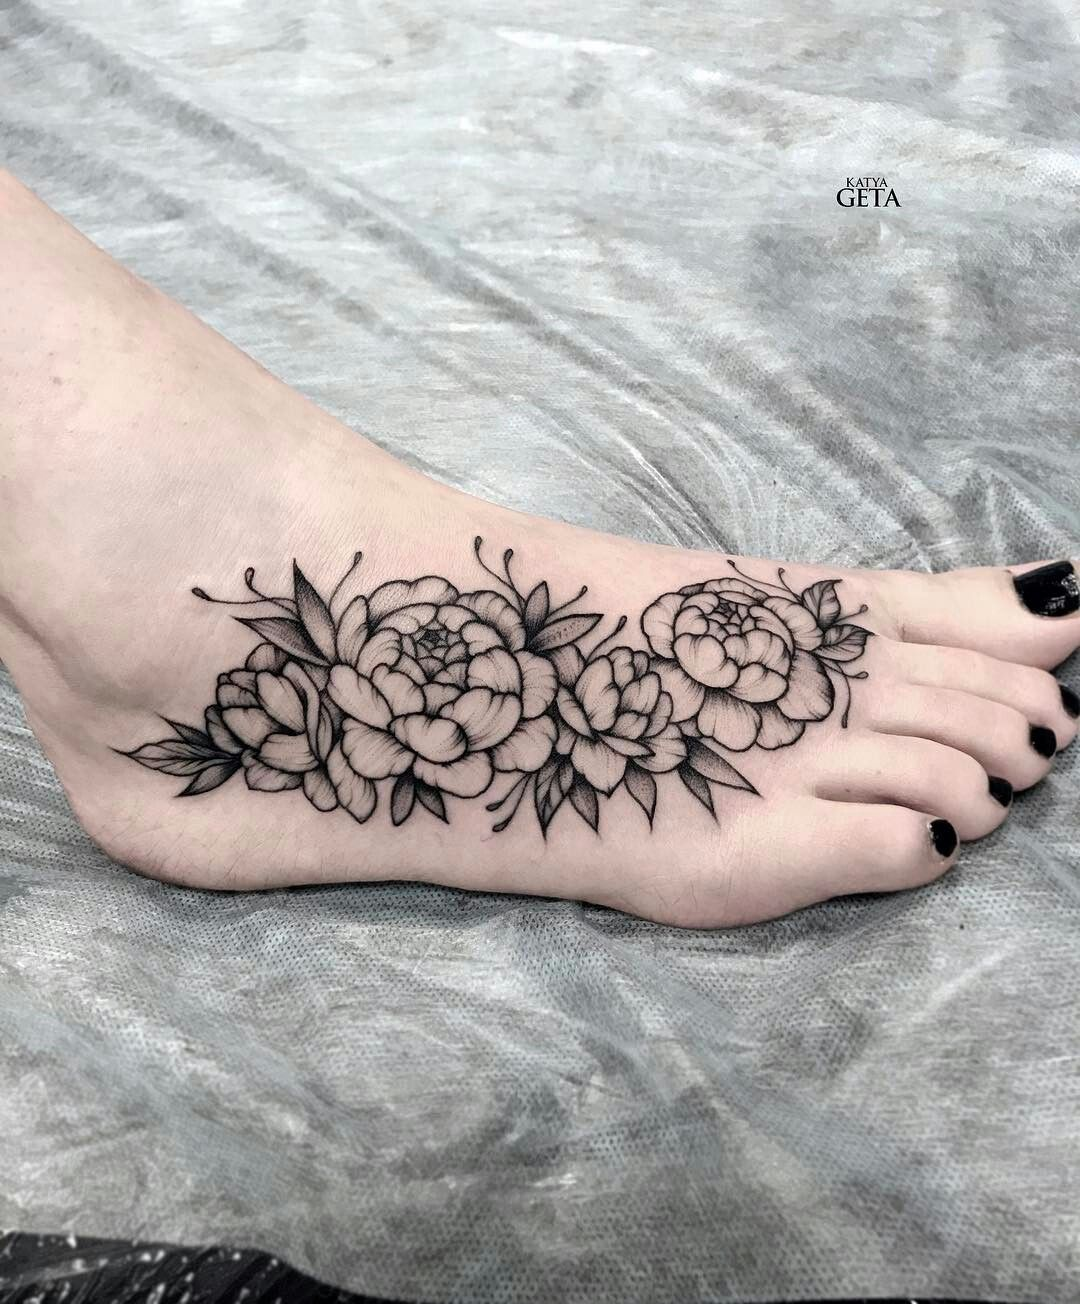 Floral Foot Tattoos : floral, tattoos, Tattoo, Flowers, @katyageta, Instagram, Tattoos, Women,, Floral, Tattoo,, Sunflower